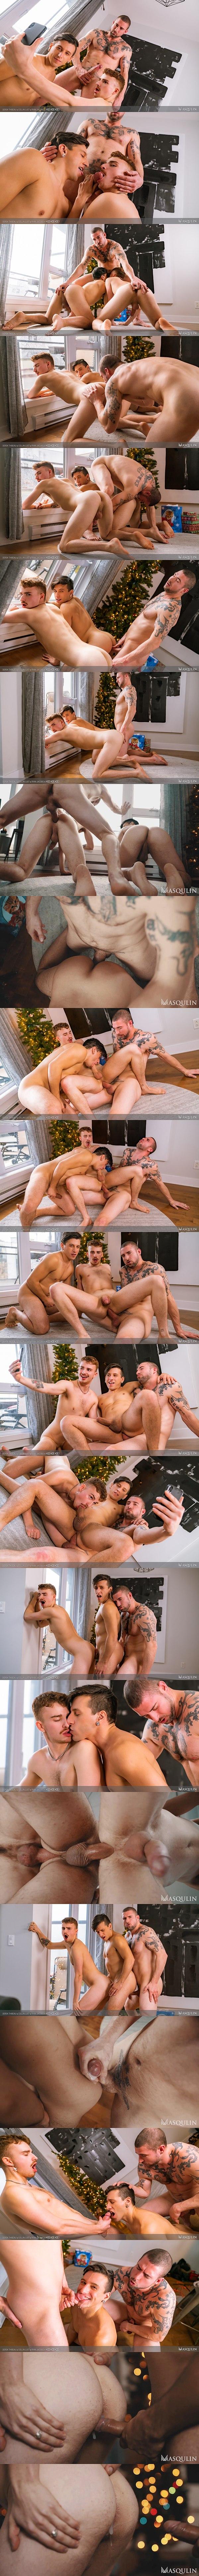 Masculine inked straight beefcake Derek Thibeau barebacks Collin Lust and Ryan Jacobs before Collin creampies Ryan in a raw threesome at Masqulin 01